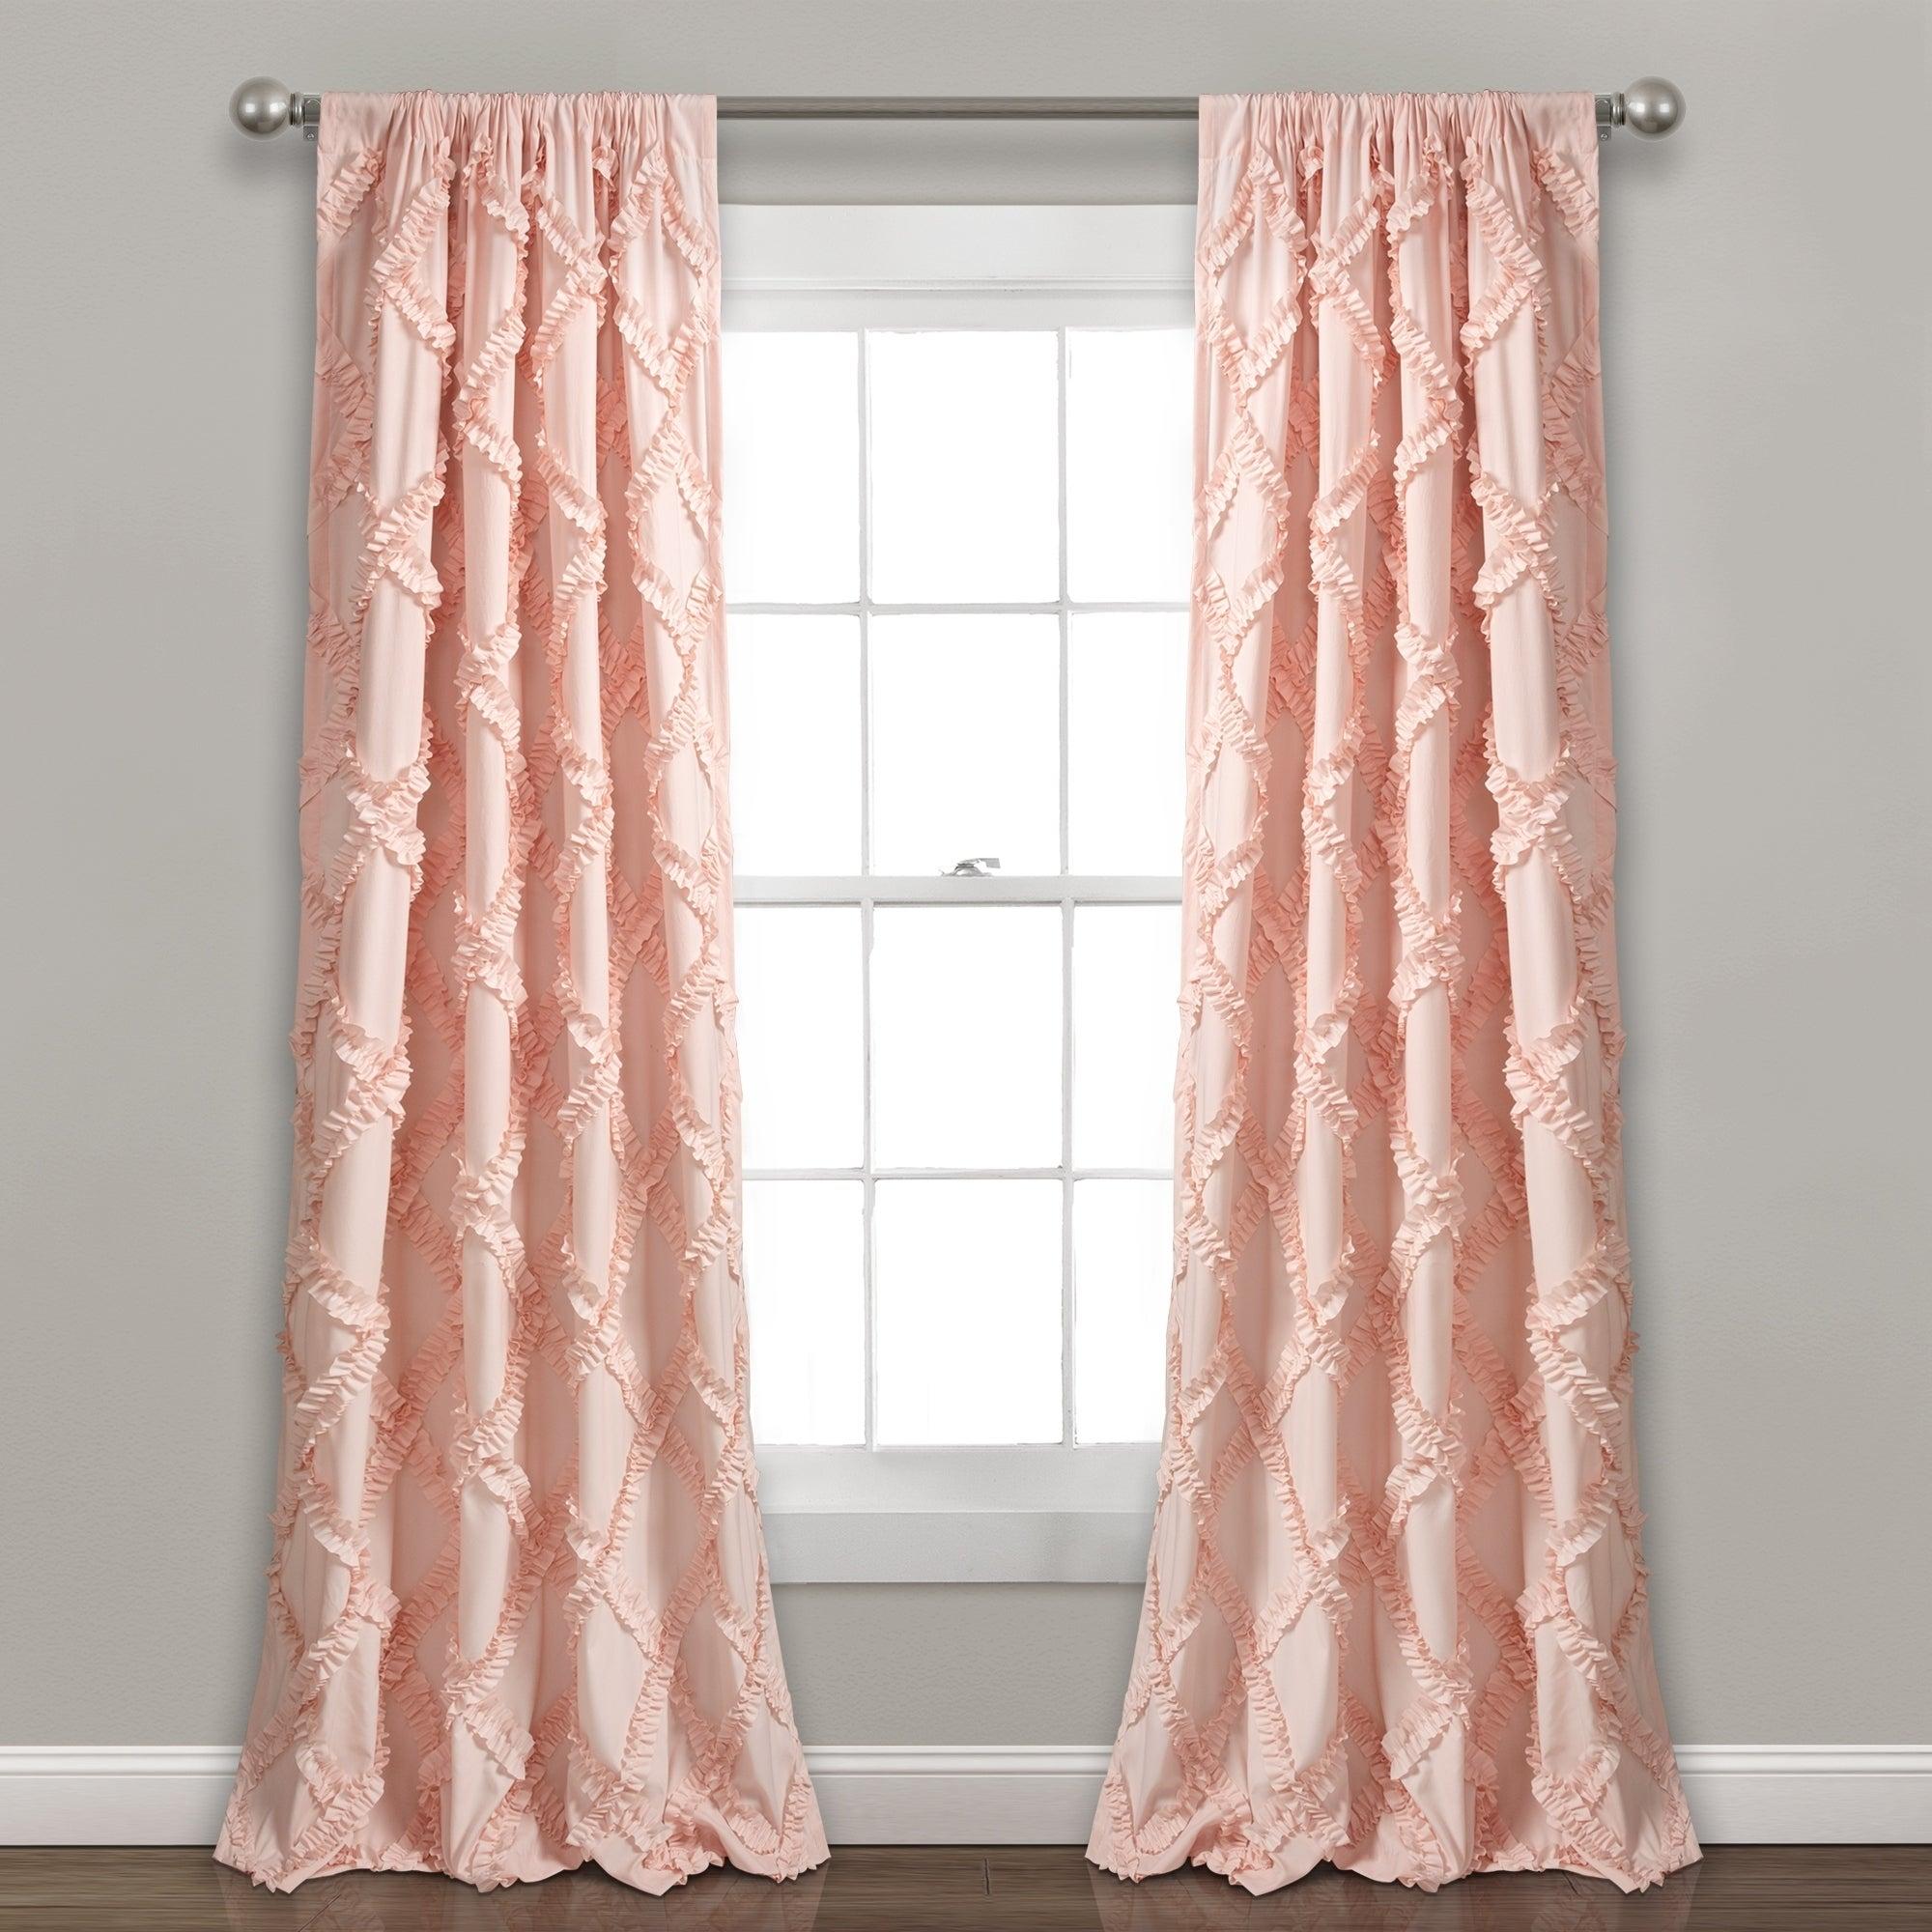 Lush Decor Ruffle Diamond Curtain Panel Pair For Ruffle Diamond Curtain Panel Pairs (View 6 of 20)